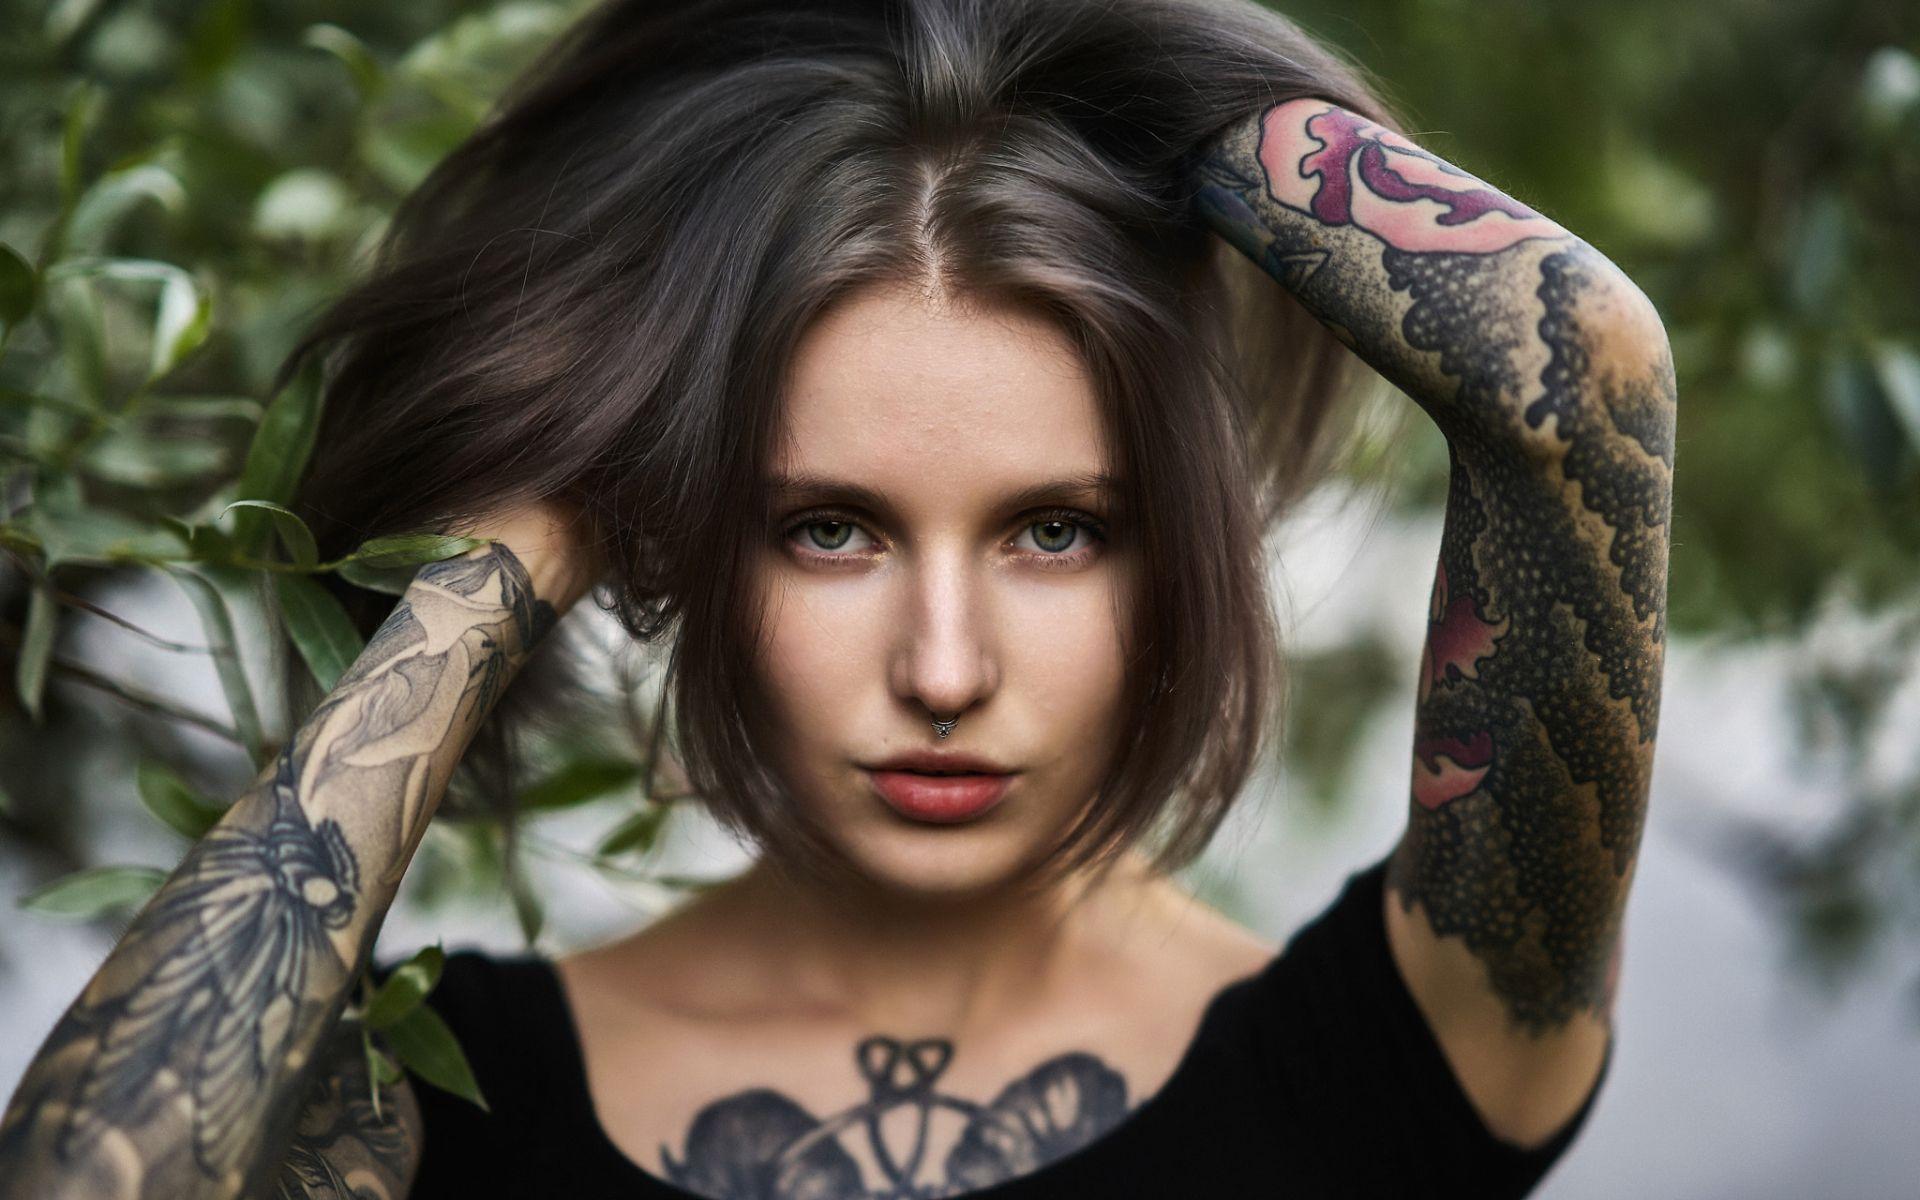 Tatuaze 081 Kobieta Tapety Na Pulpit